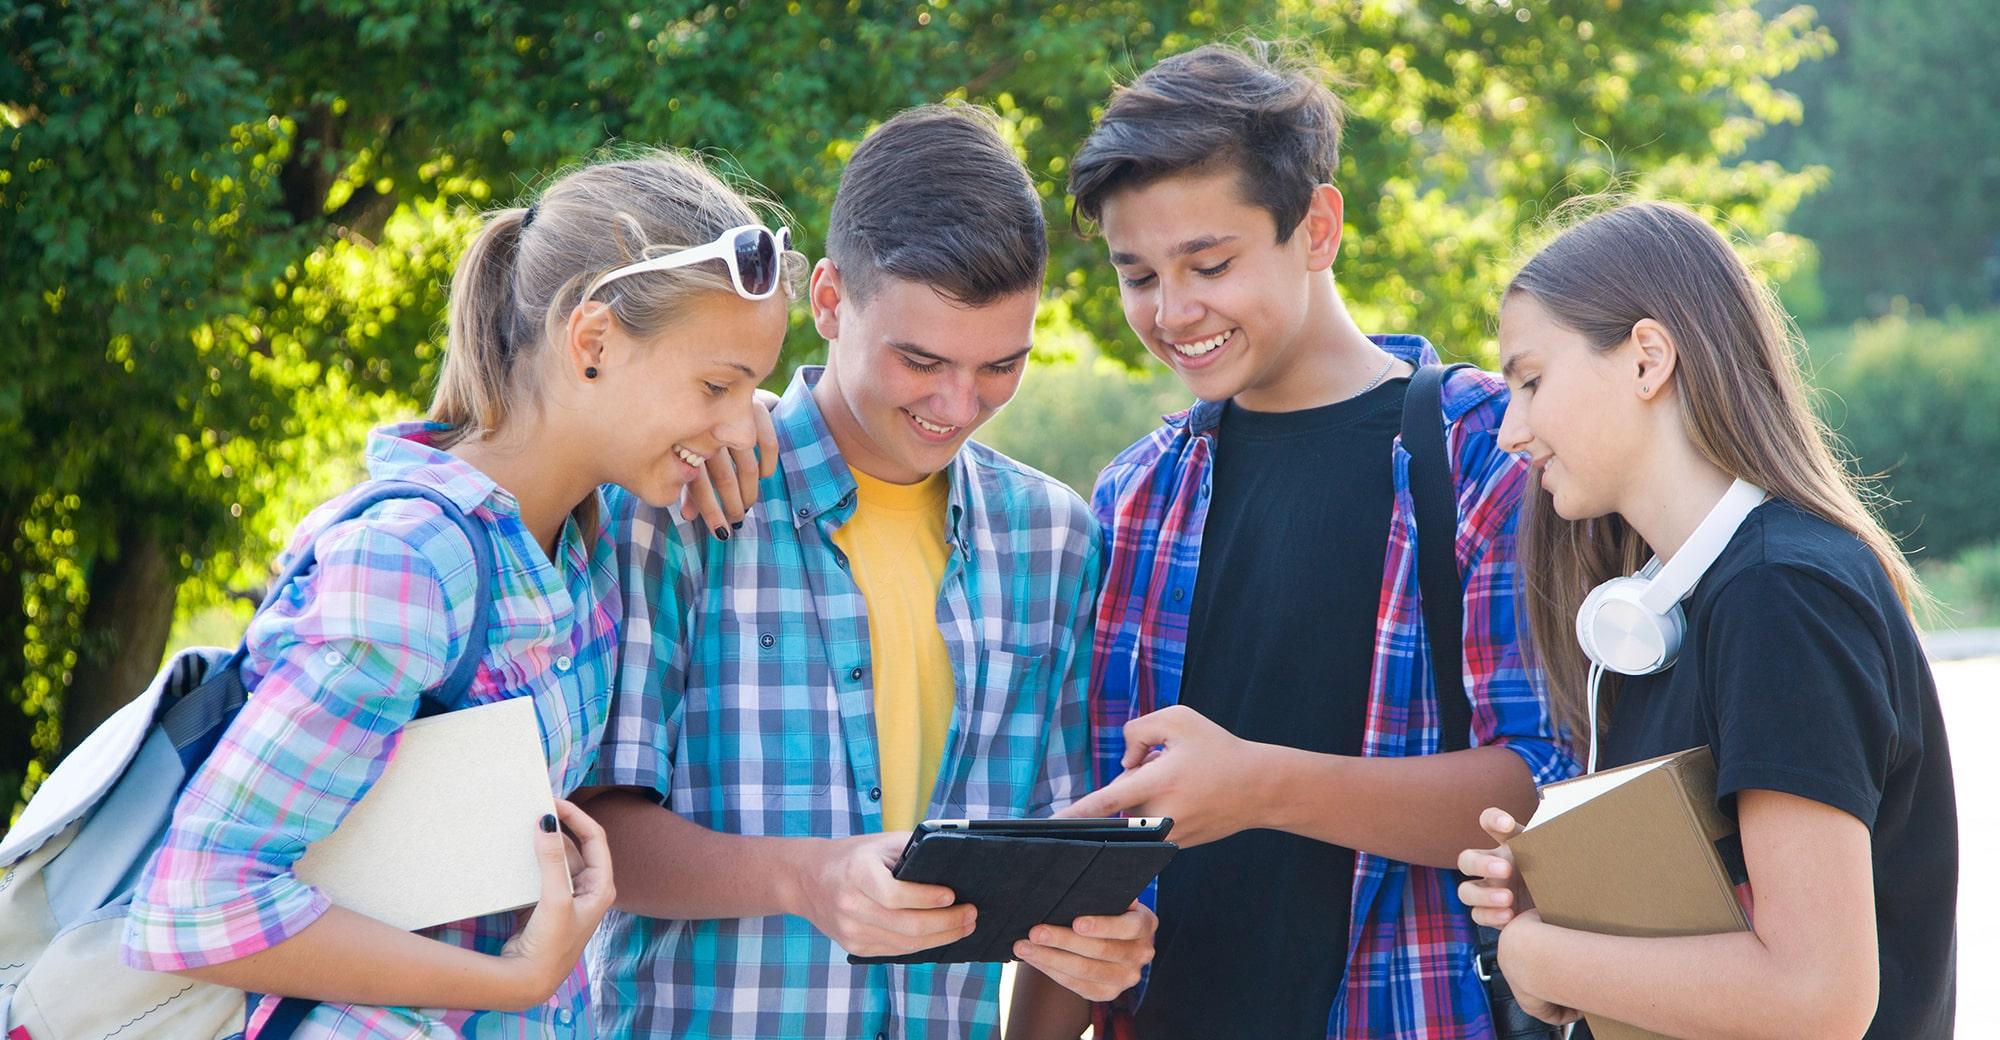 Jugendliche mit Tablet, Foto: yanlev – stock.adobe.com